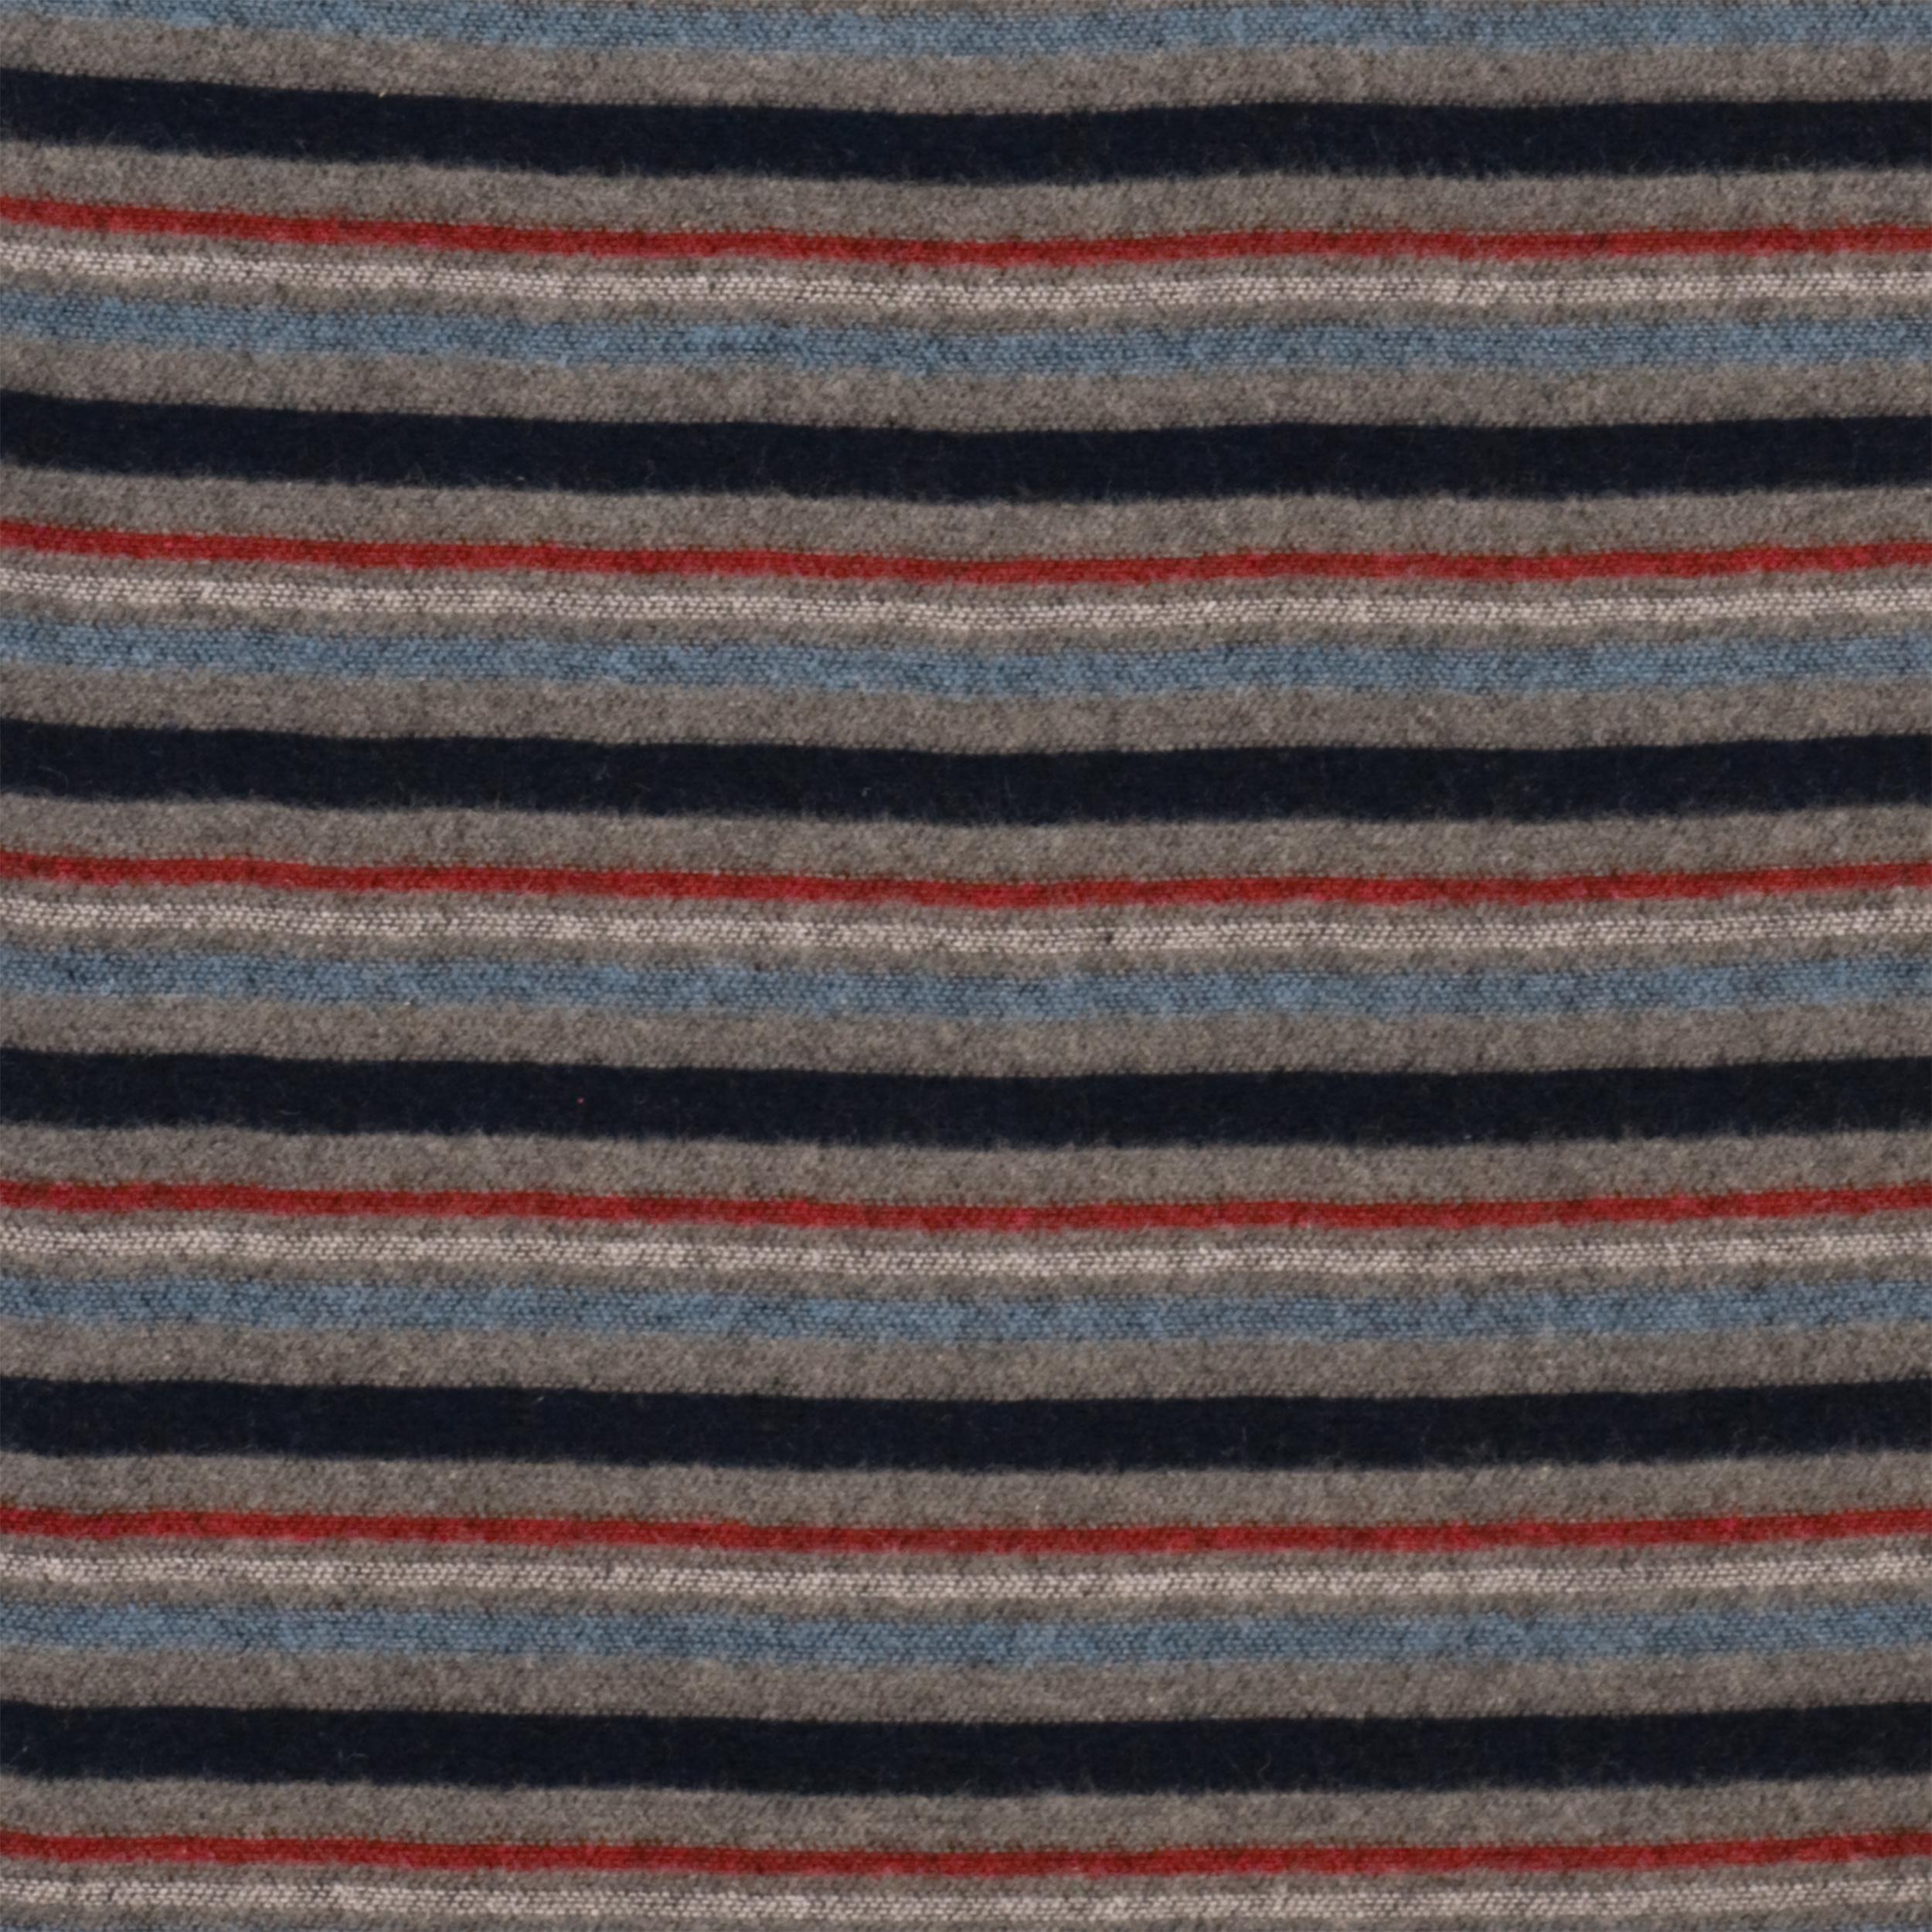 Alpine Stripe (Wool-Blend)